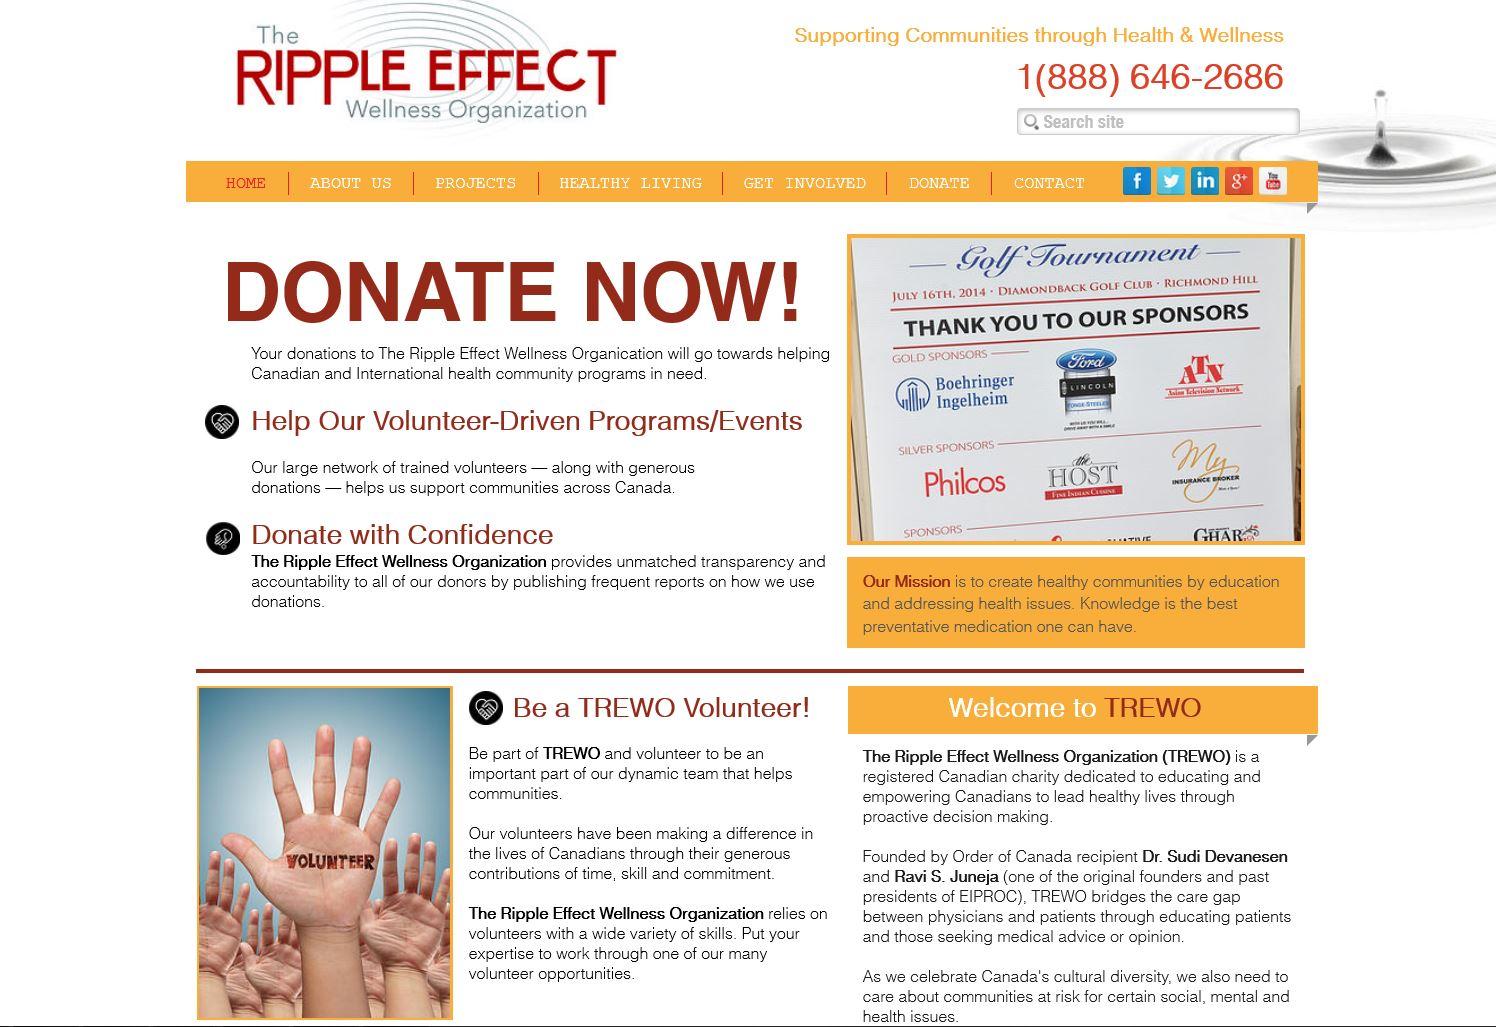 The Ripple Effect Wellness Org.